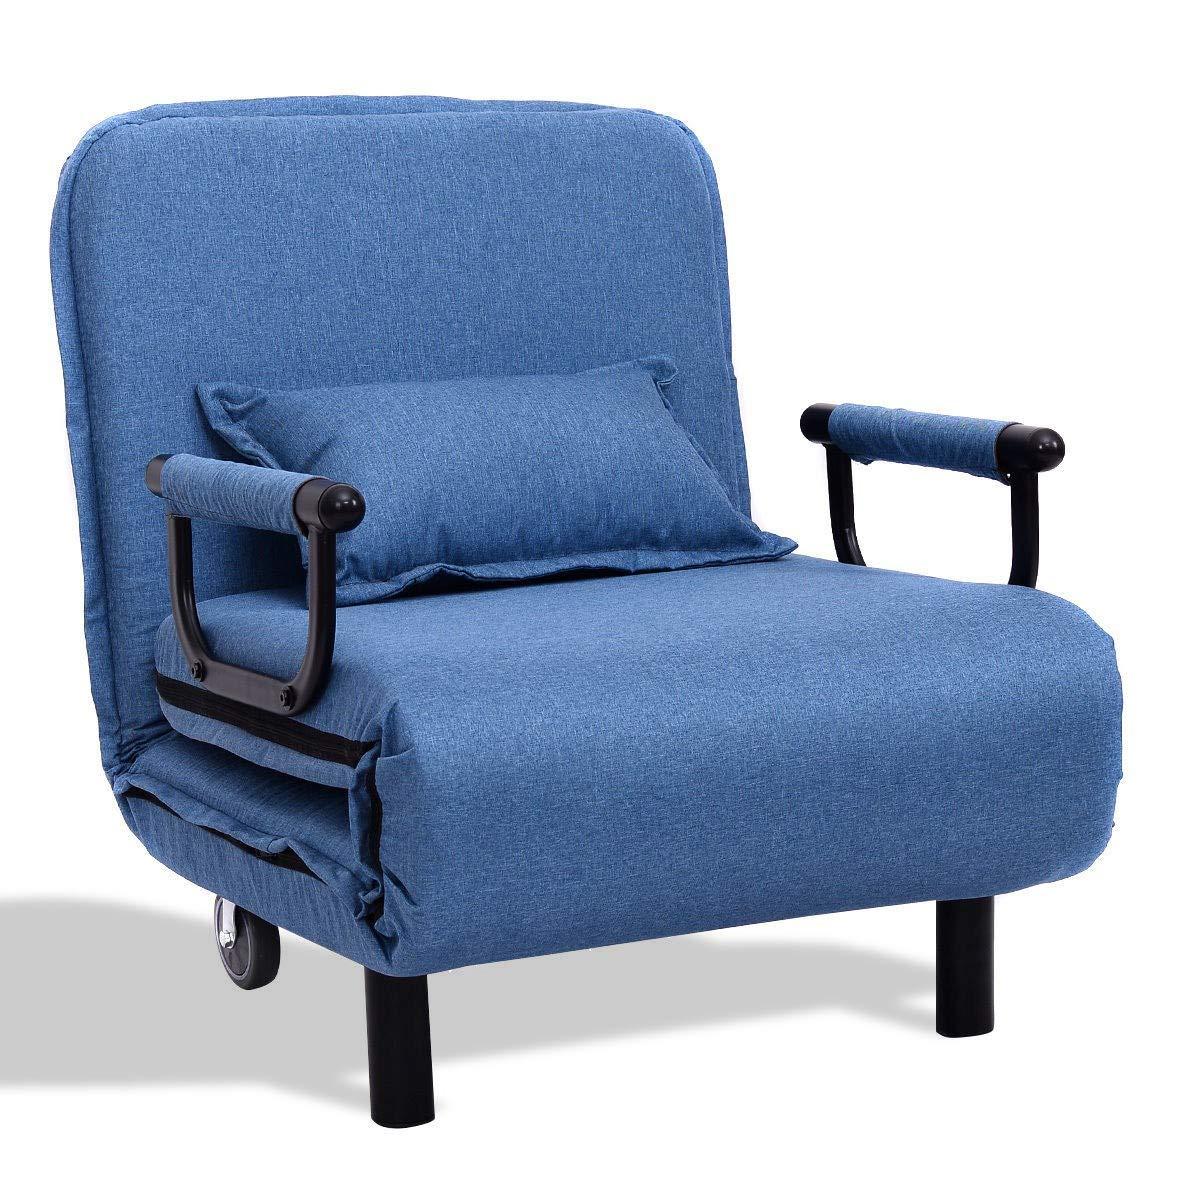 Amazon.com: Sofá cama convertible plegable 3 en 1 ...